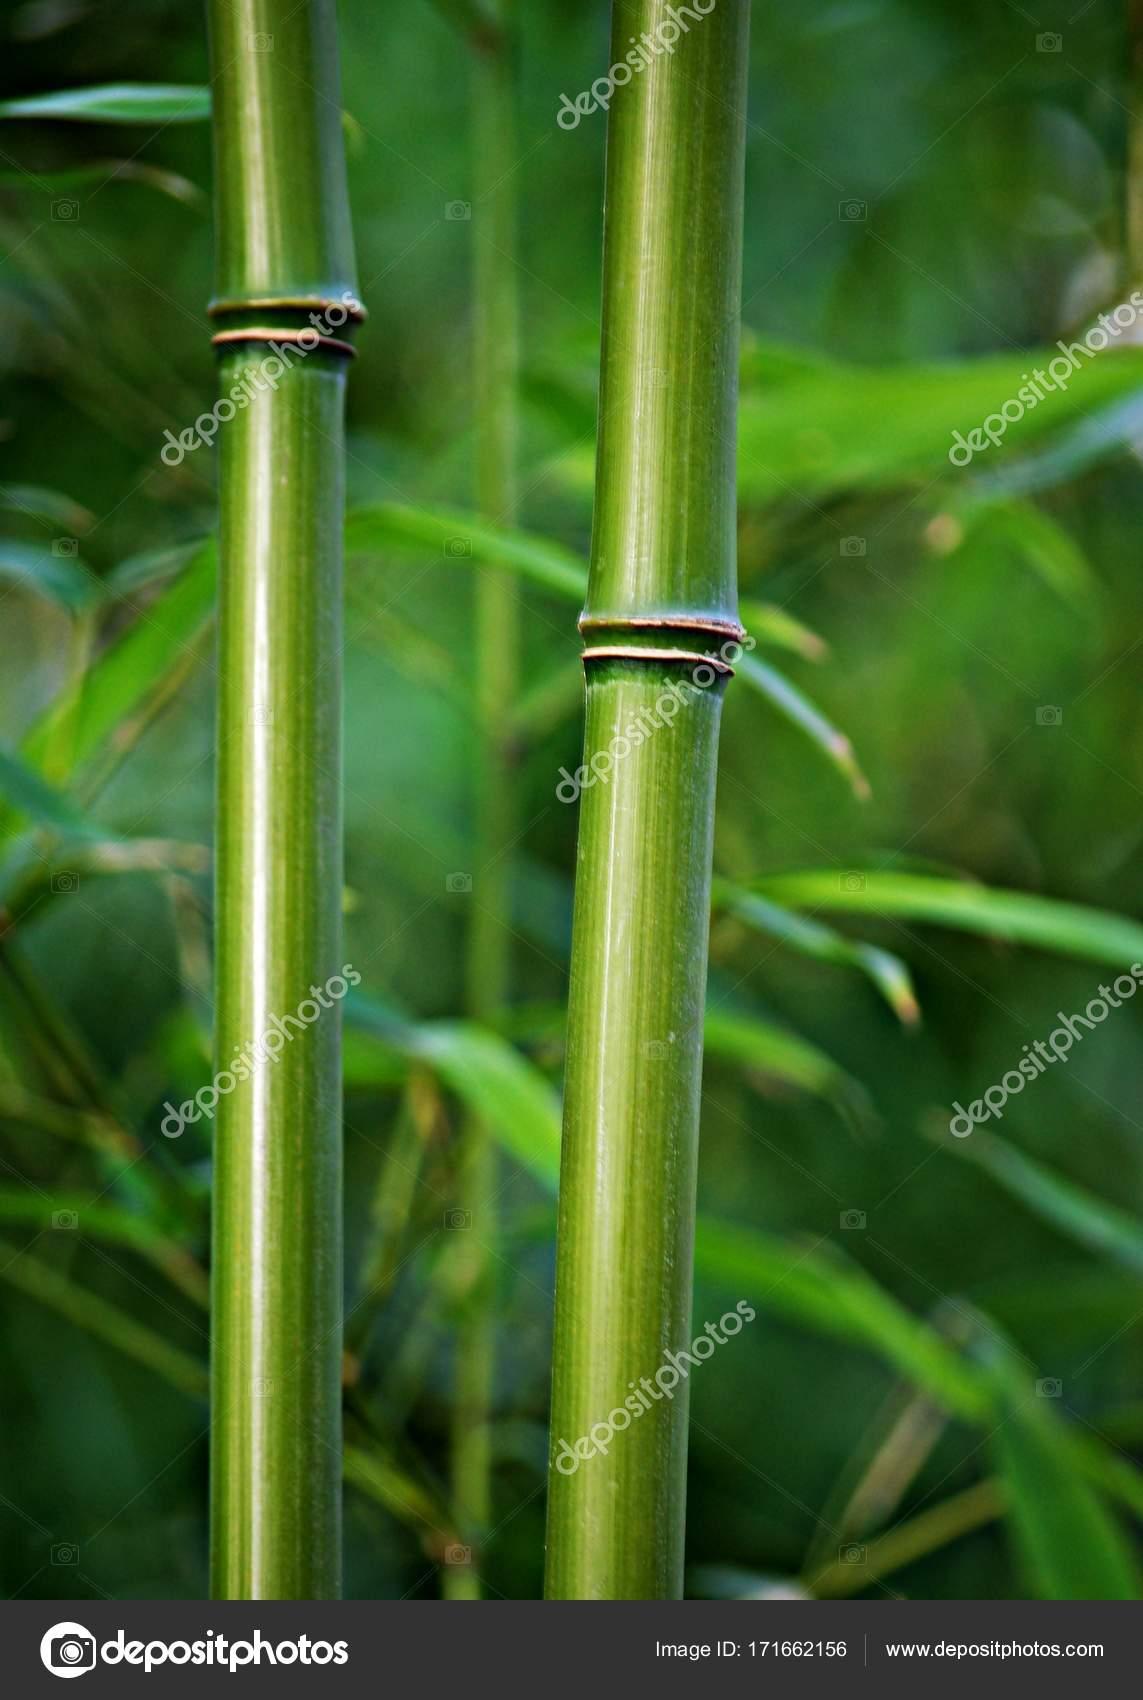 bambus staebe gruen photographie gabii40 171662156. Black Bedroom Furniture Sets. Home Design Ideas